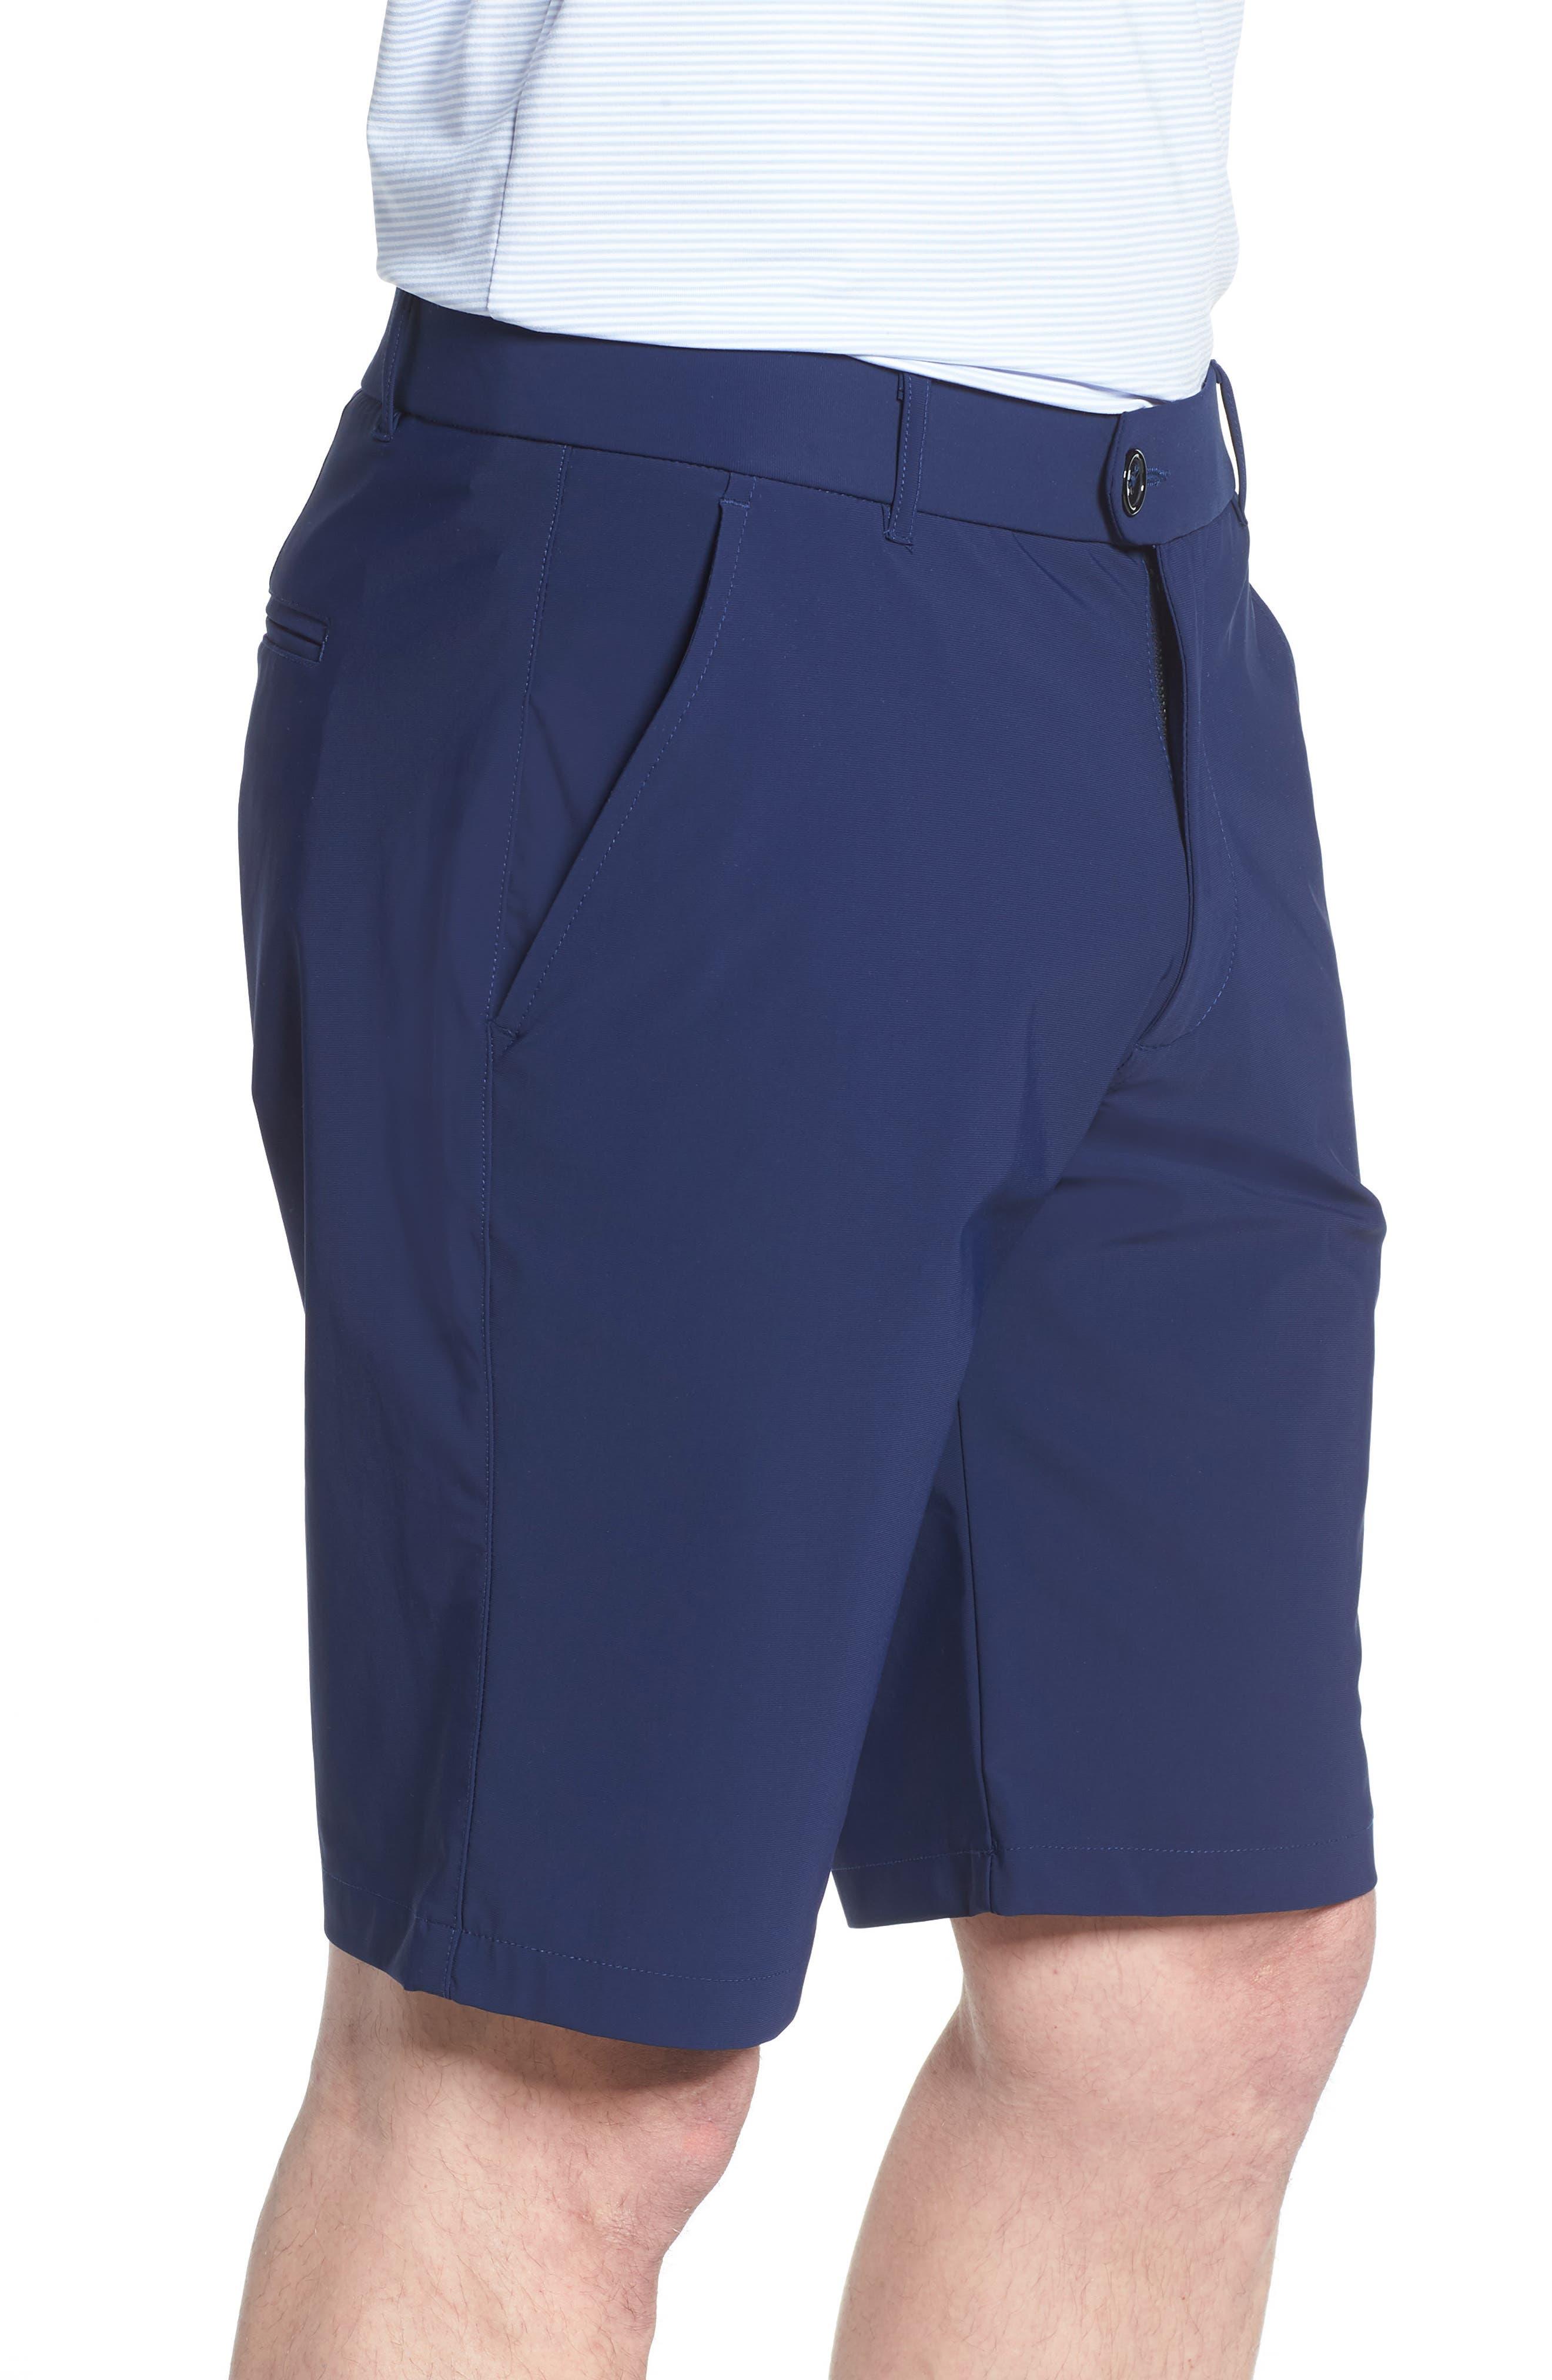 Montauk Shorts,                             Alternate thumbnail 3, color,                             Maltese